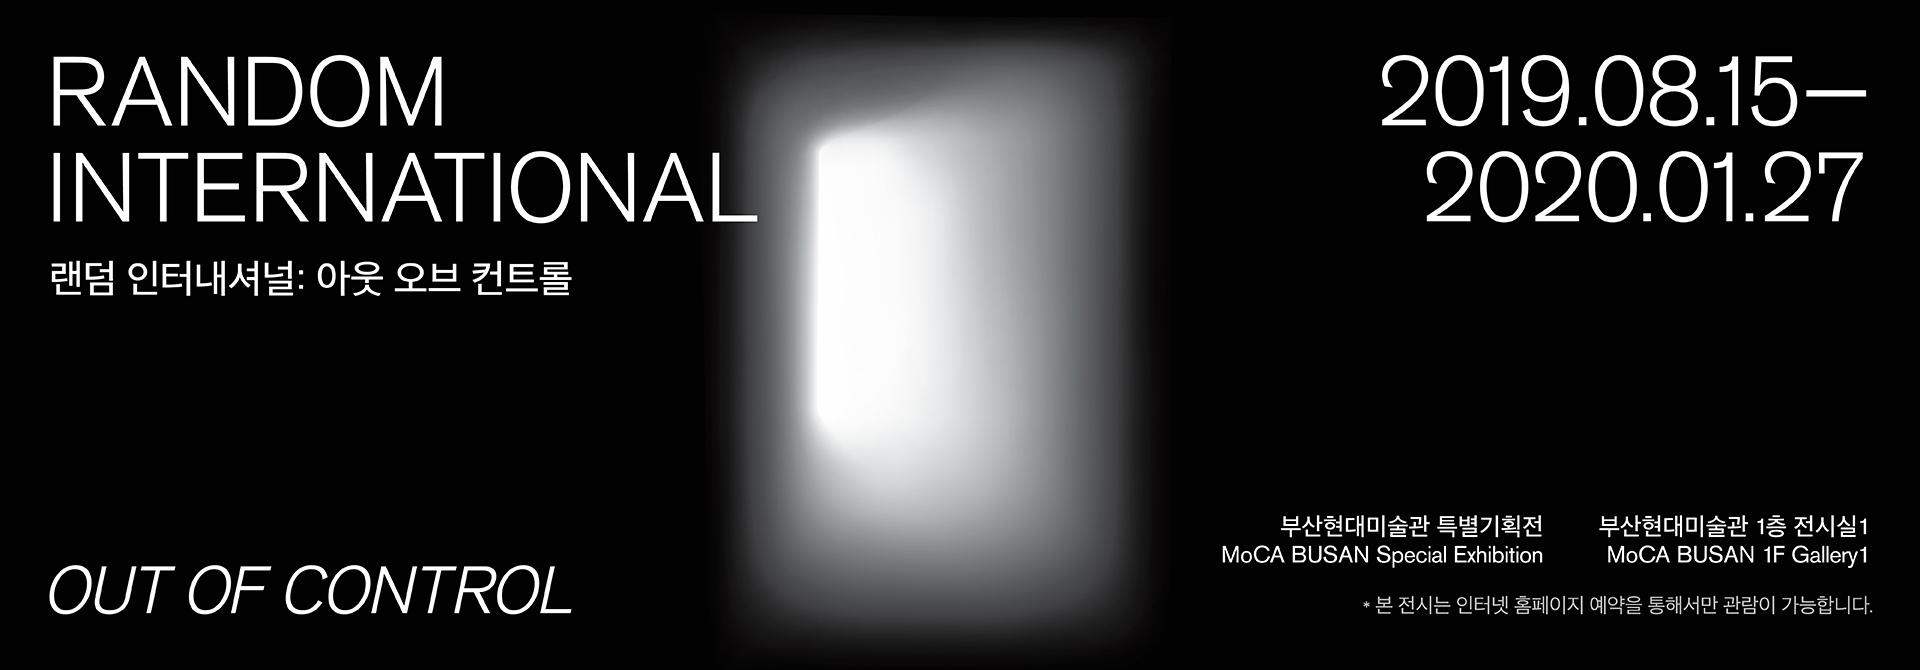 RANDOM INTERNATIONAL: OUT OF CONTROL 랜덤 인터내셔널: 아웃 오브 컨트롤 2019.08.15 ~ 2020.01.27, 부산현대미술관 특별기획전 MoCA BUSAN Special Exhibition 부산현대미술관 1층 전시실1 MoCA BUSAN 1F Gallery1